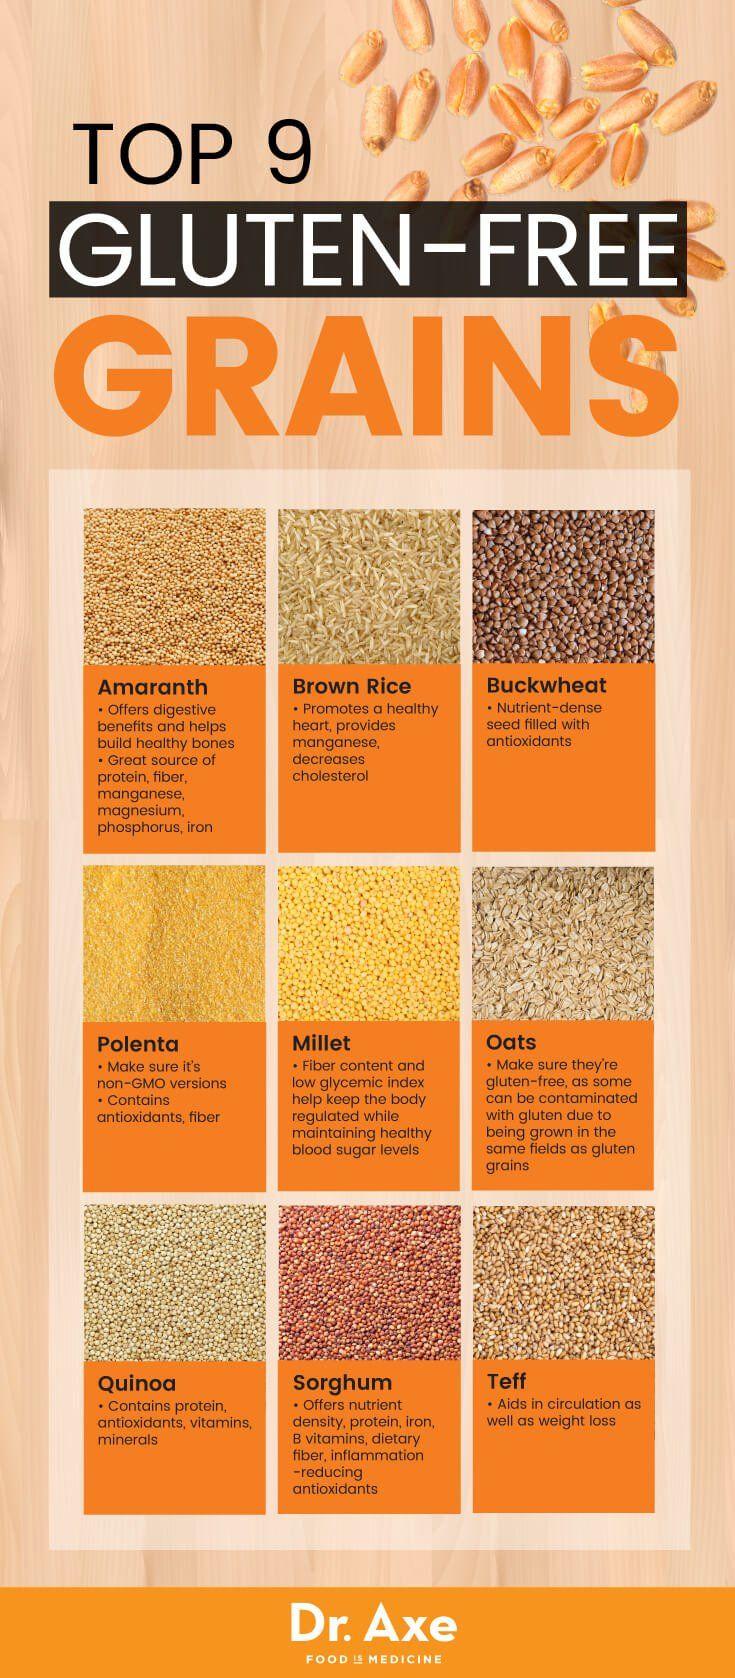 Top nine gluten-free grains - Dr. Axe http://www.draxe.com #health #keto #holistic #natural #recipe